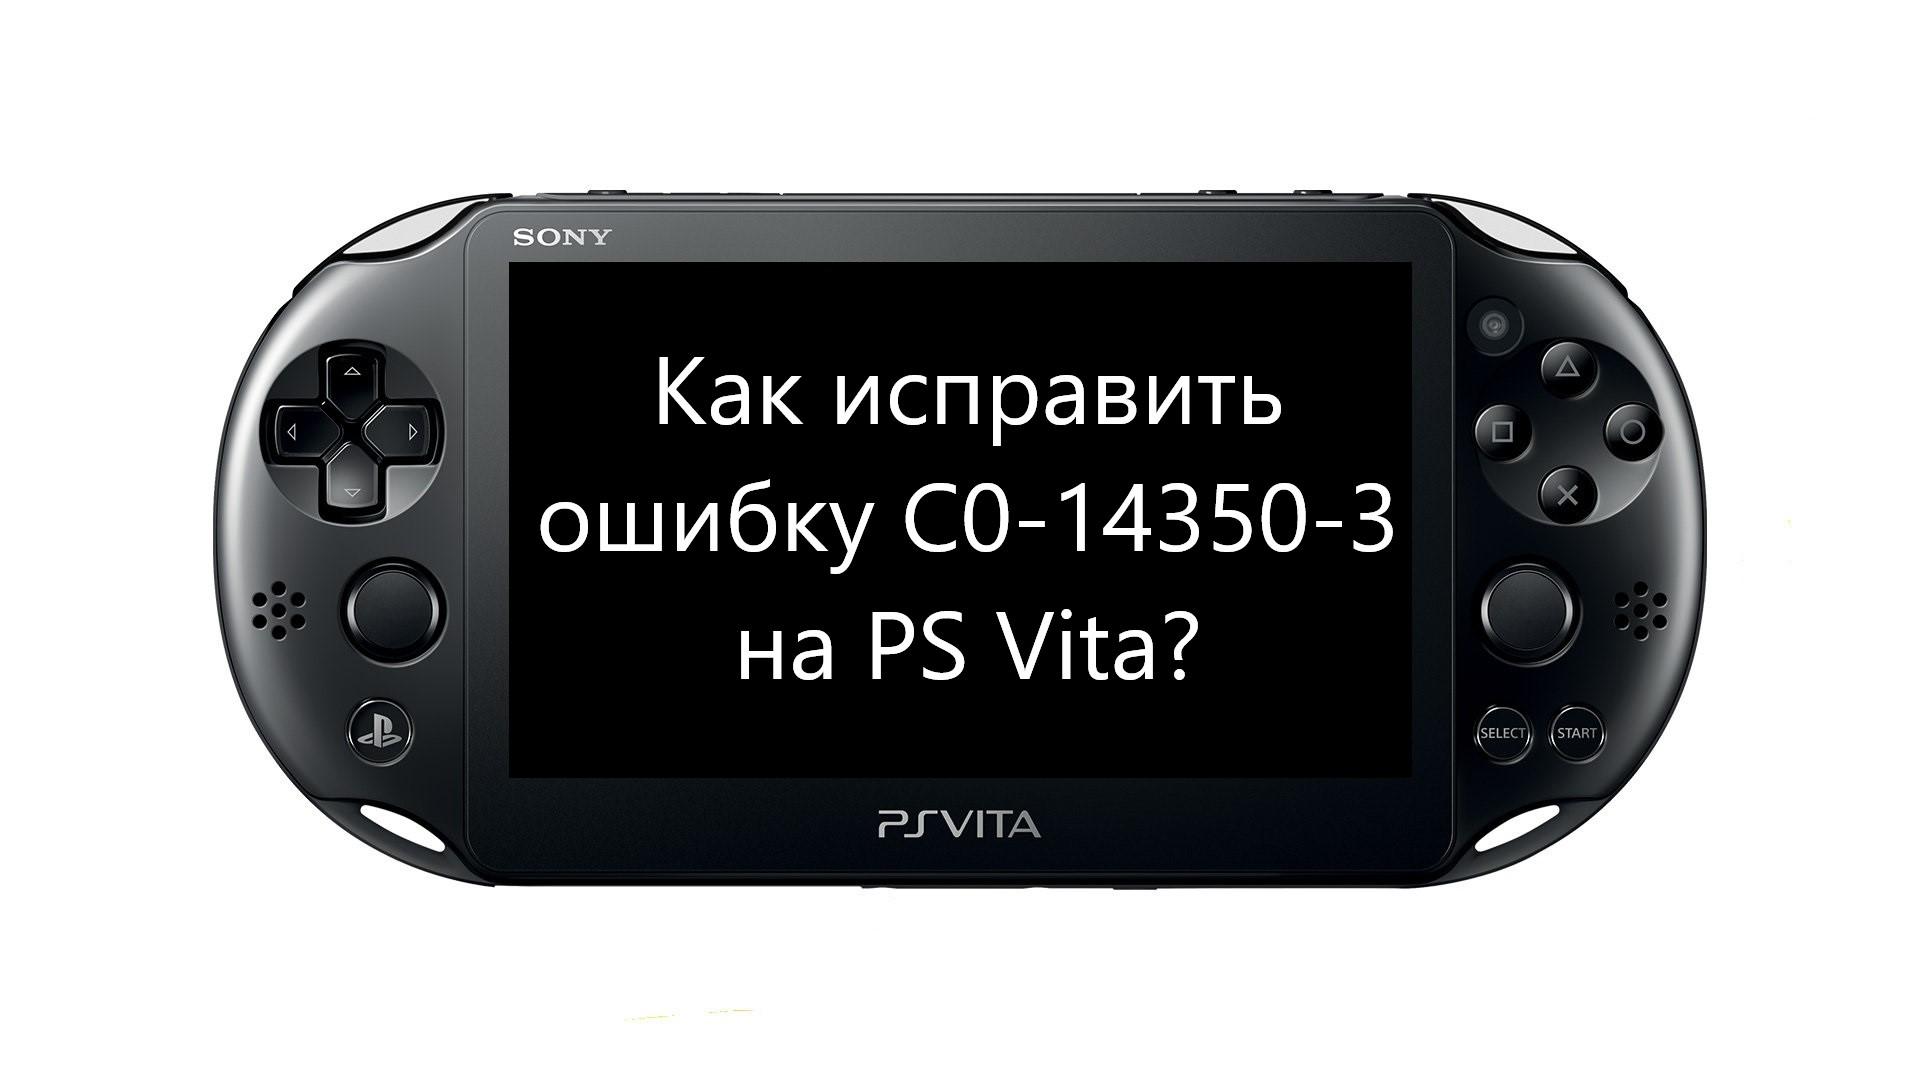 C0-14350-3